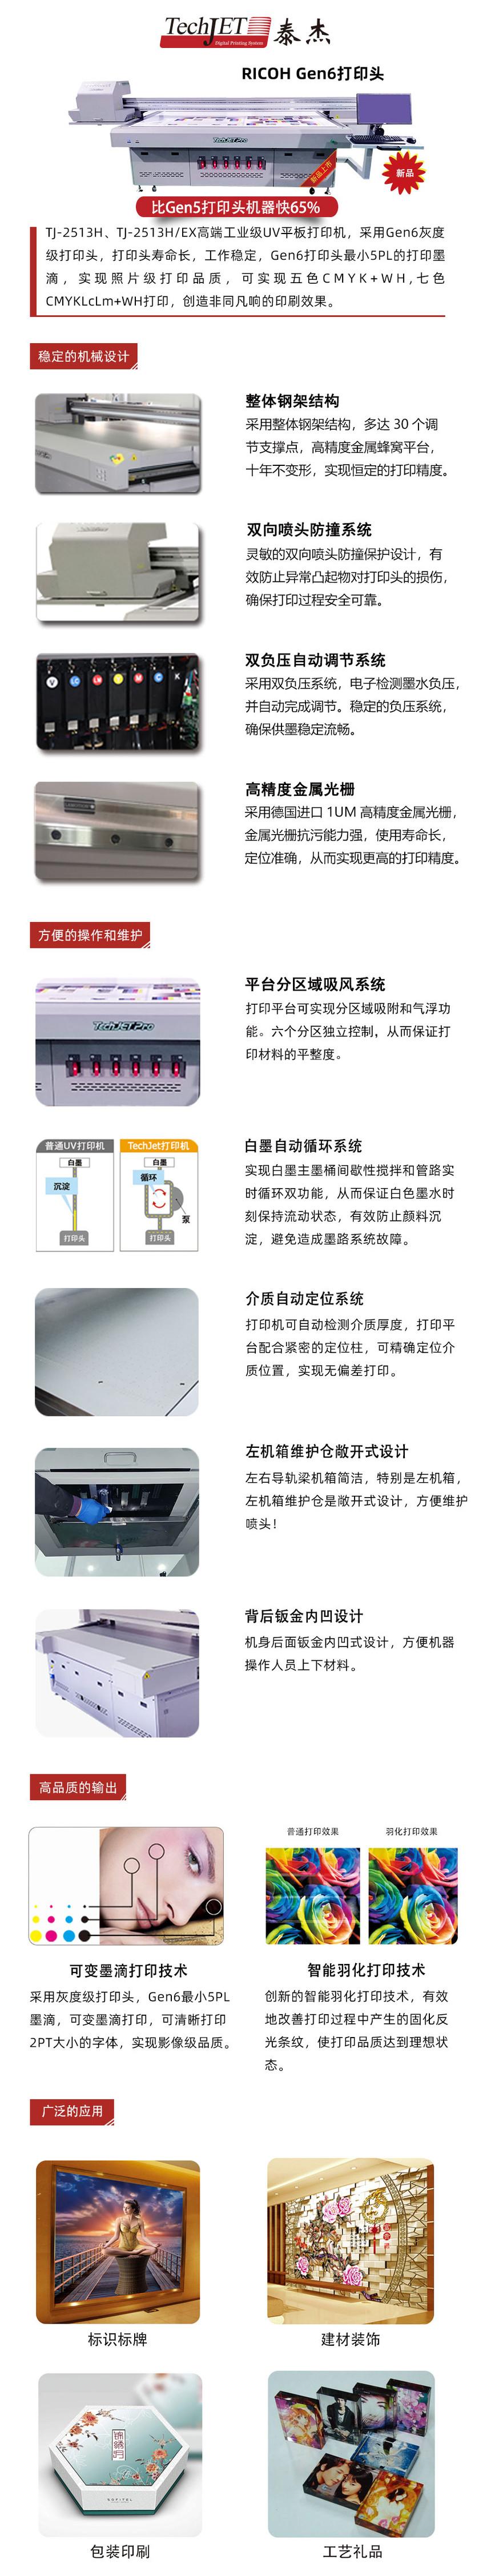 TJ-2513H和2513HEX中文产品说明微信版.jpg